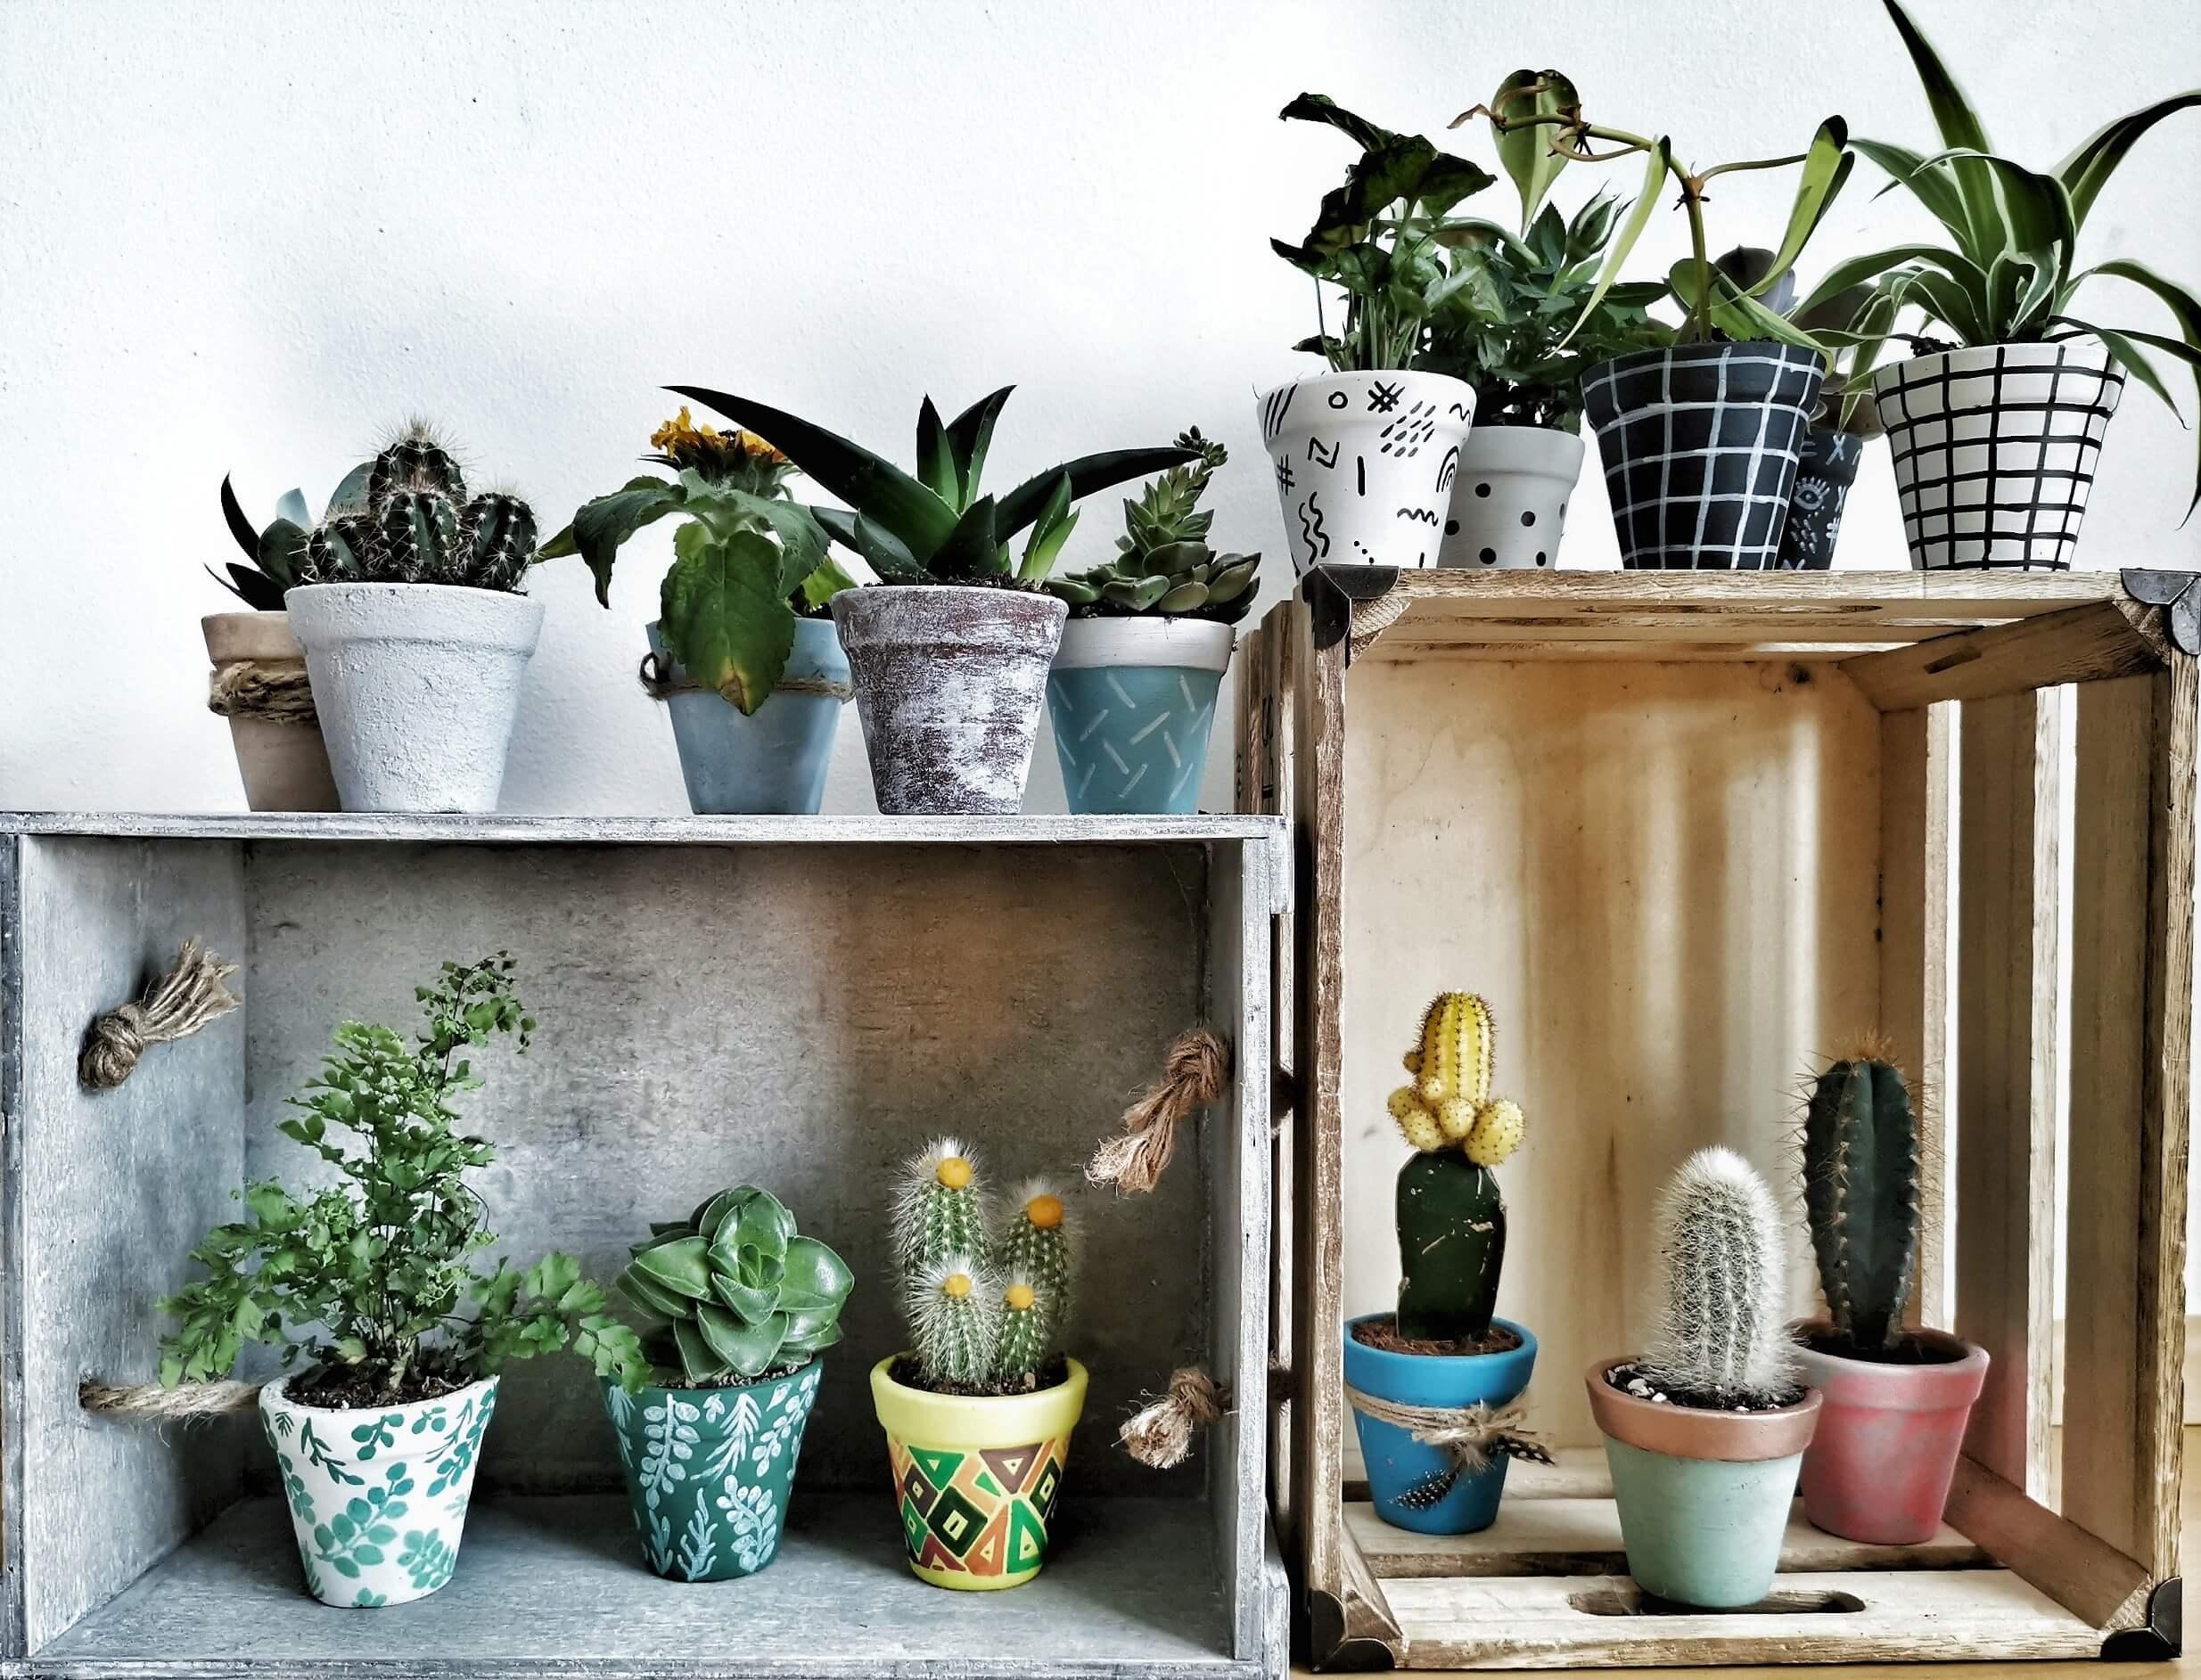 IMG 20190612 130221 1 01 resized 20190612 062905475 - Kreatives Recycling: Blumentöpfe in 5 verschiedenen Stilen